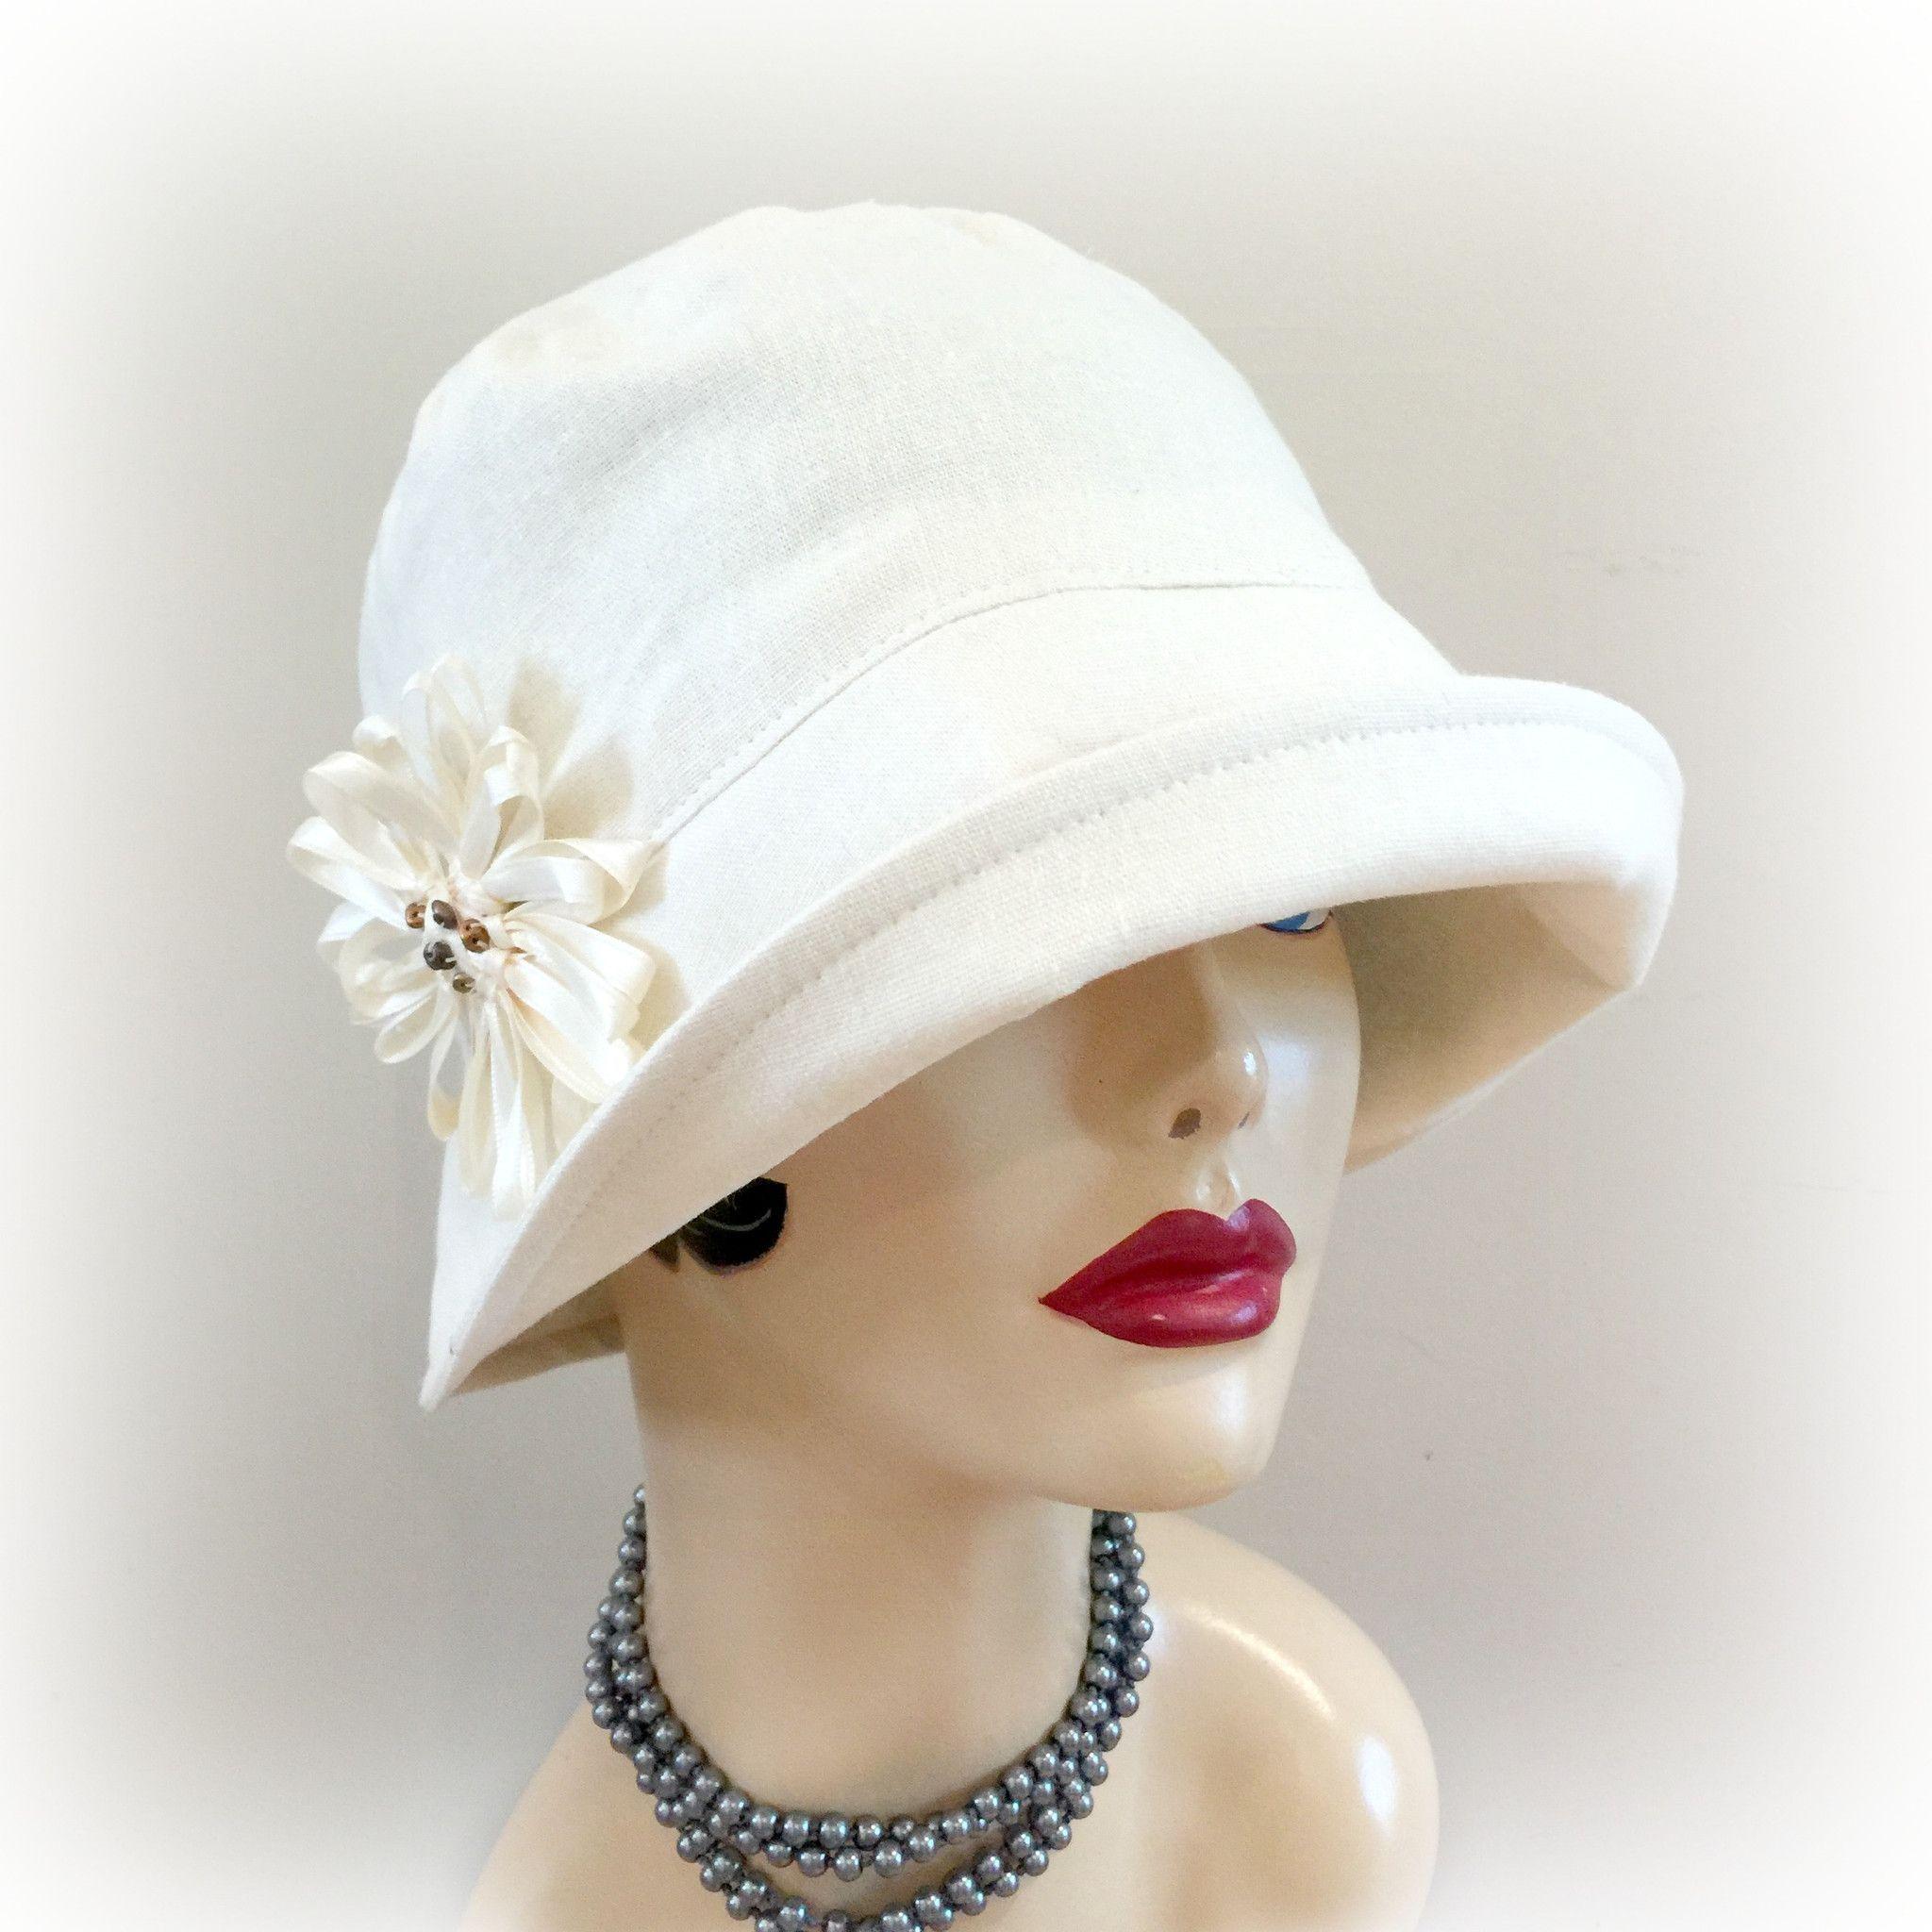 526c4acdc7fb29 Bucket Hat Cream Linen 1920s Hat Flapper Hat Vintage Style Sunhat Sun  Protection Chemo Cream Linen Cloche Women's Sunhat Eleanor Handmade in the  USA